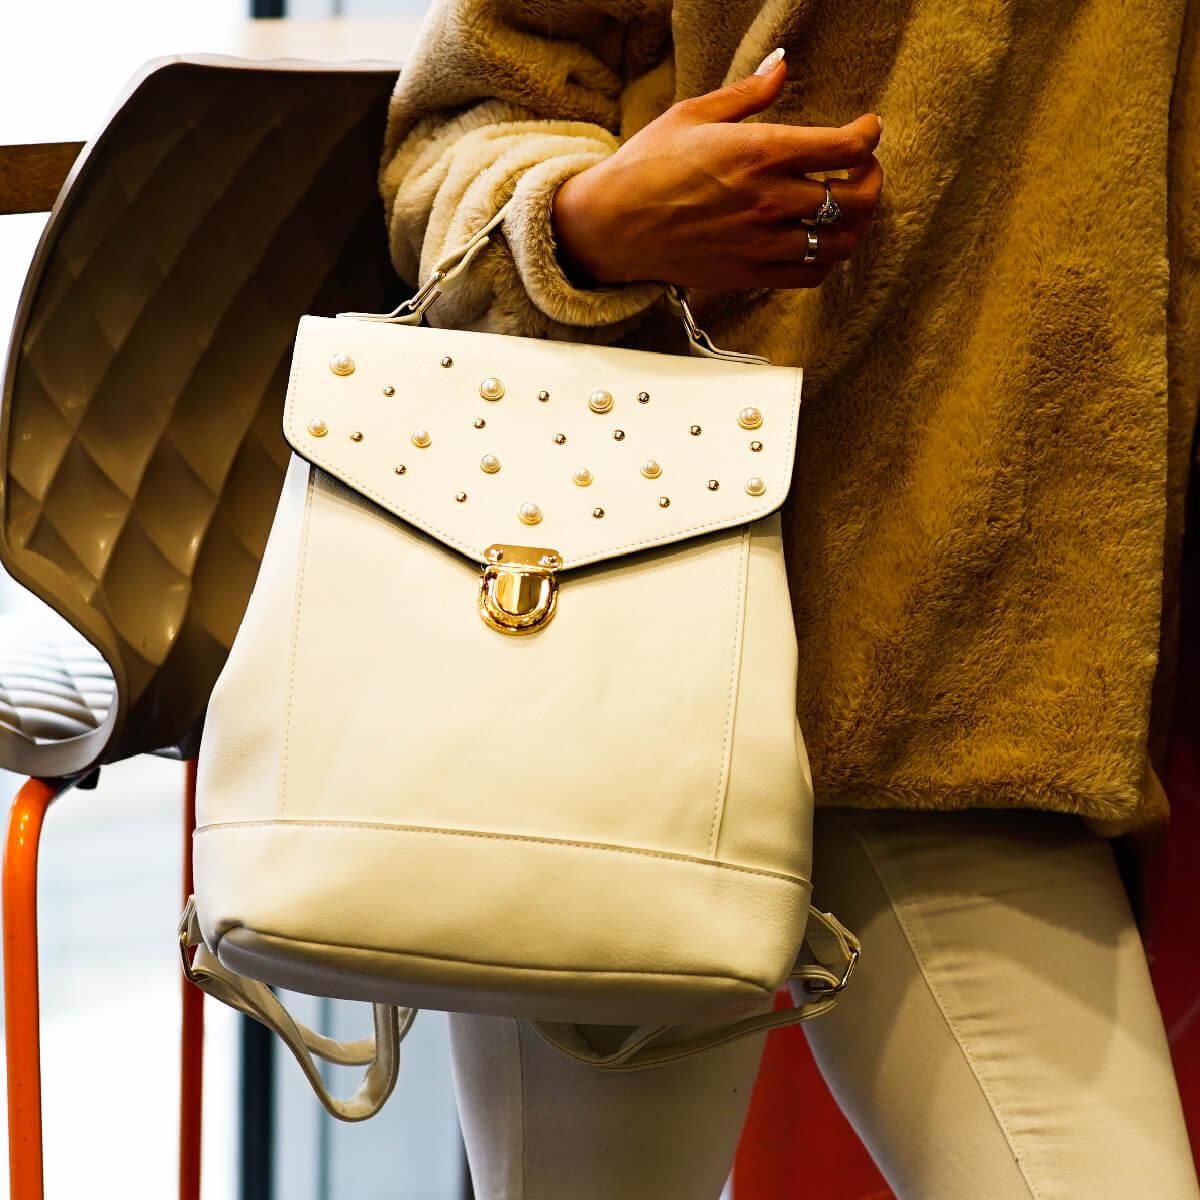 3472506718c51 plecaki skórzane damskie · czarny plecak · plecak skórzany damski · plecak  skórzany · plecaki damskie skórzane ...